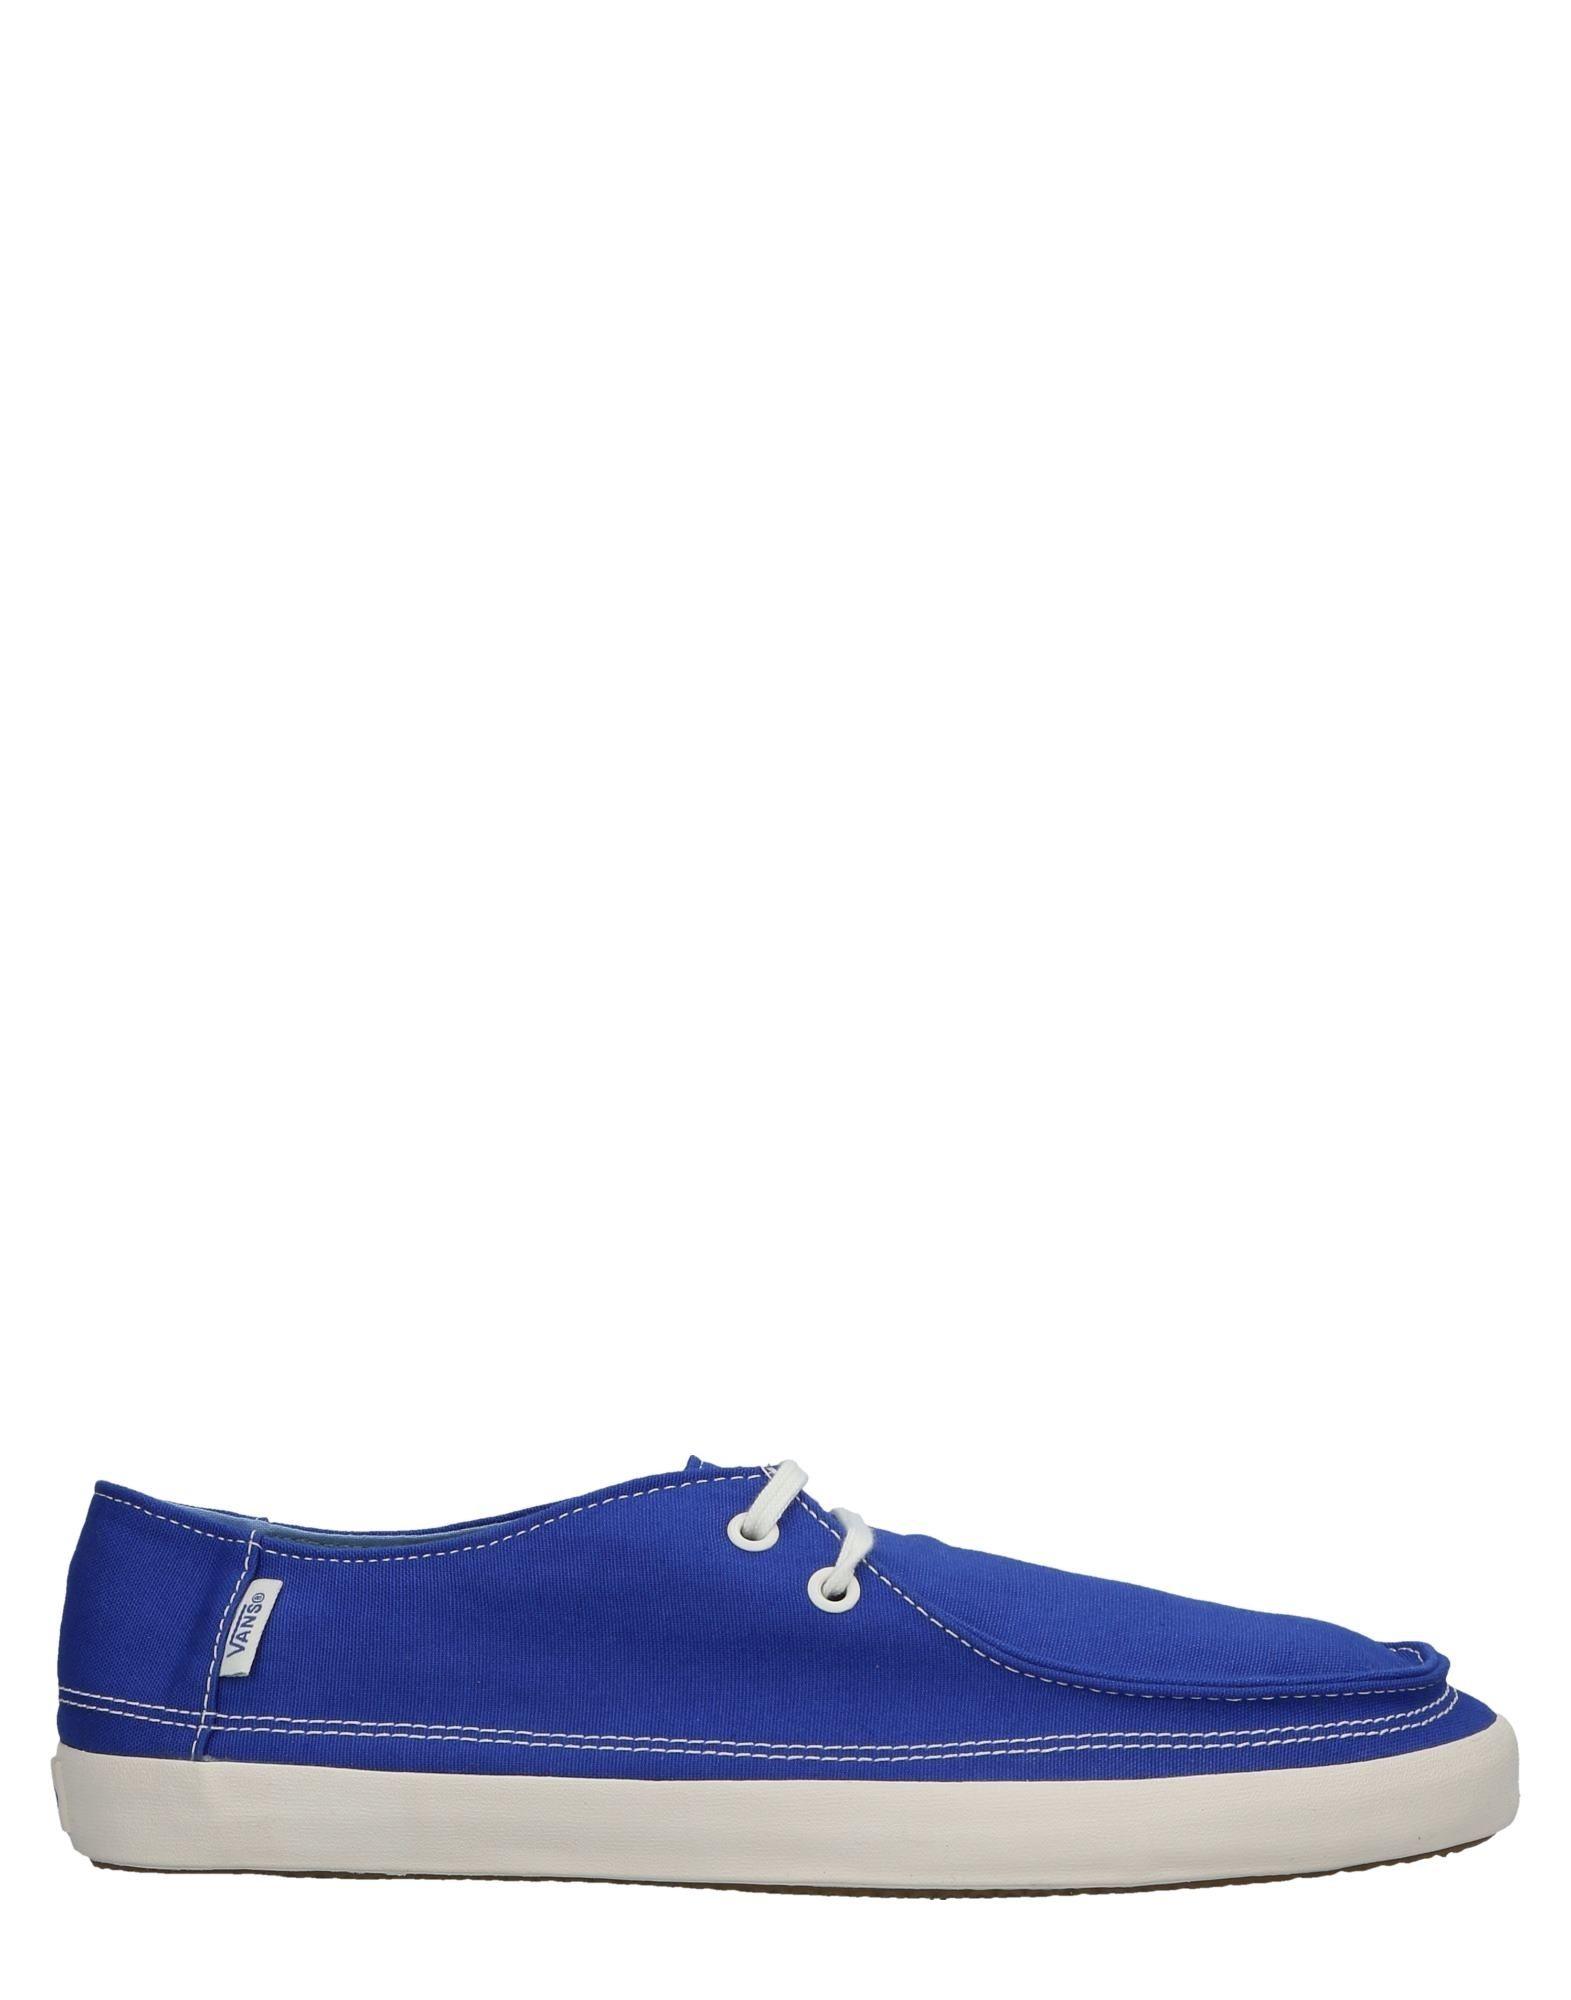 Homme Chaussures Bleu Sneakers Vans Les qSCYggTEw